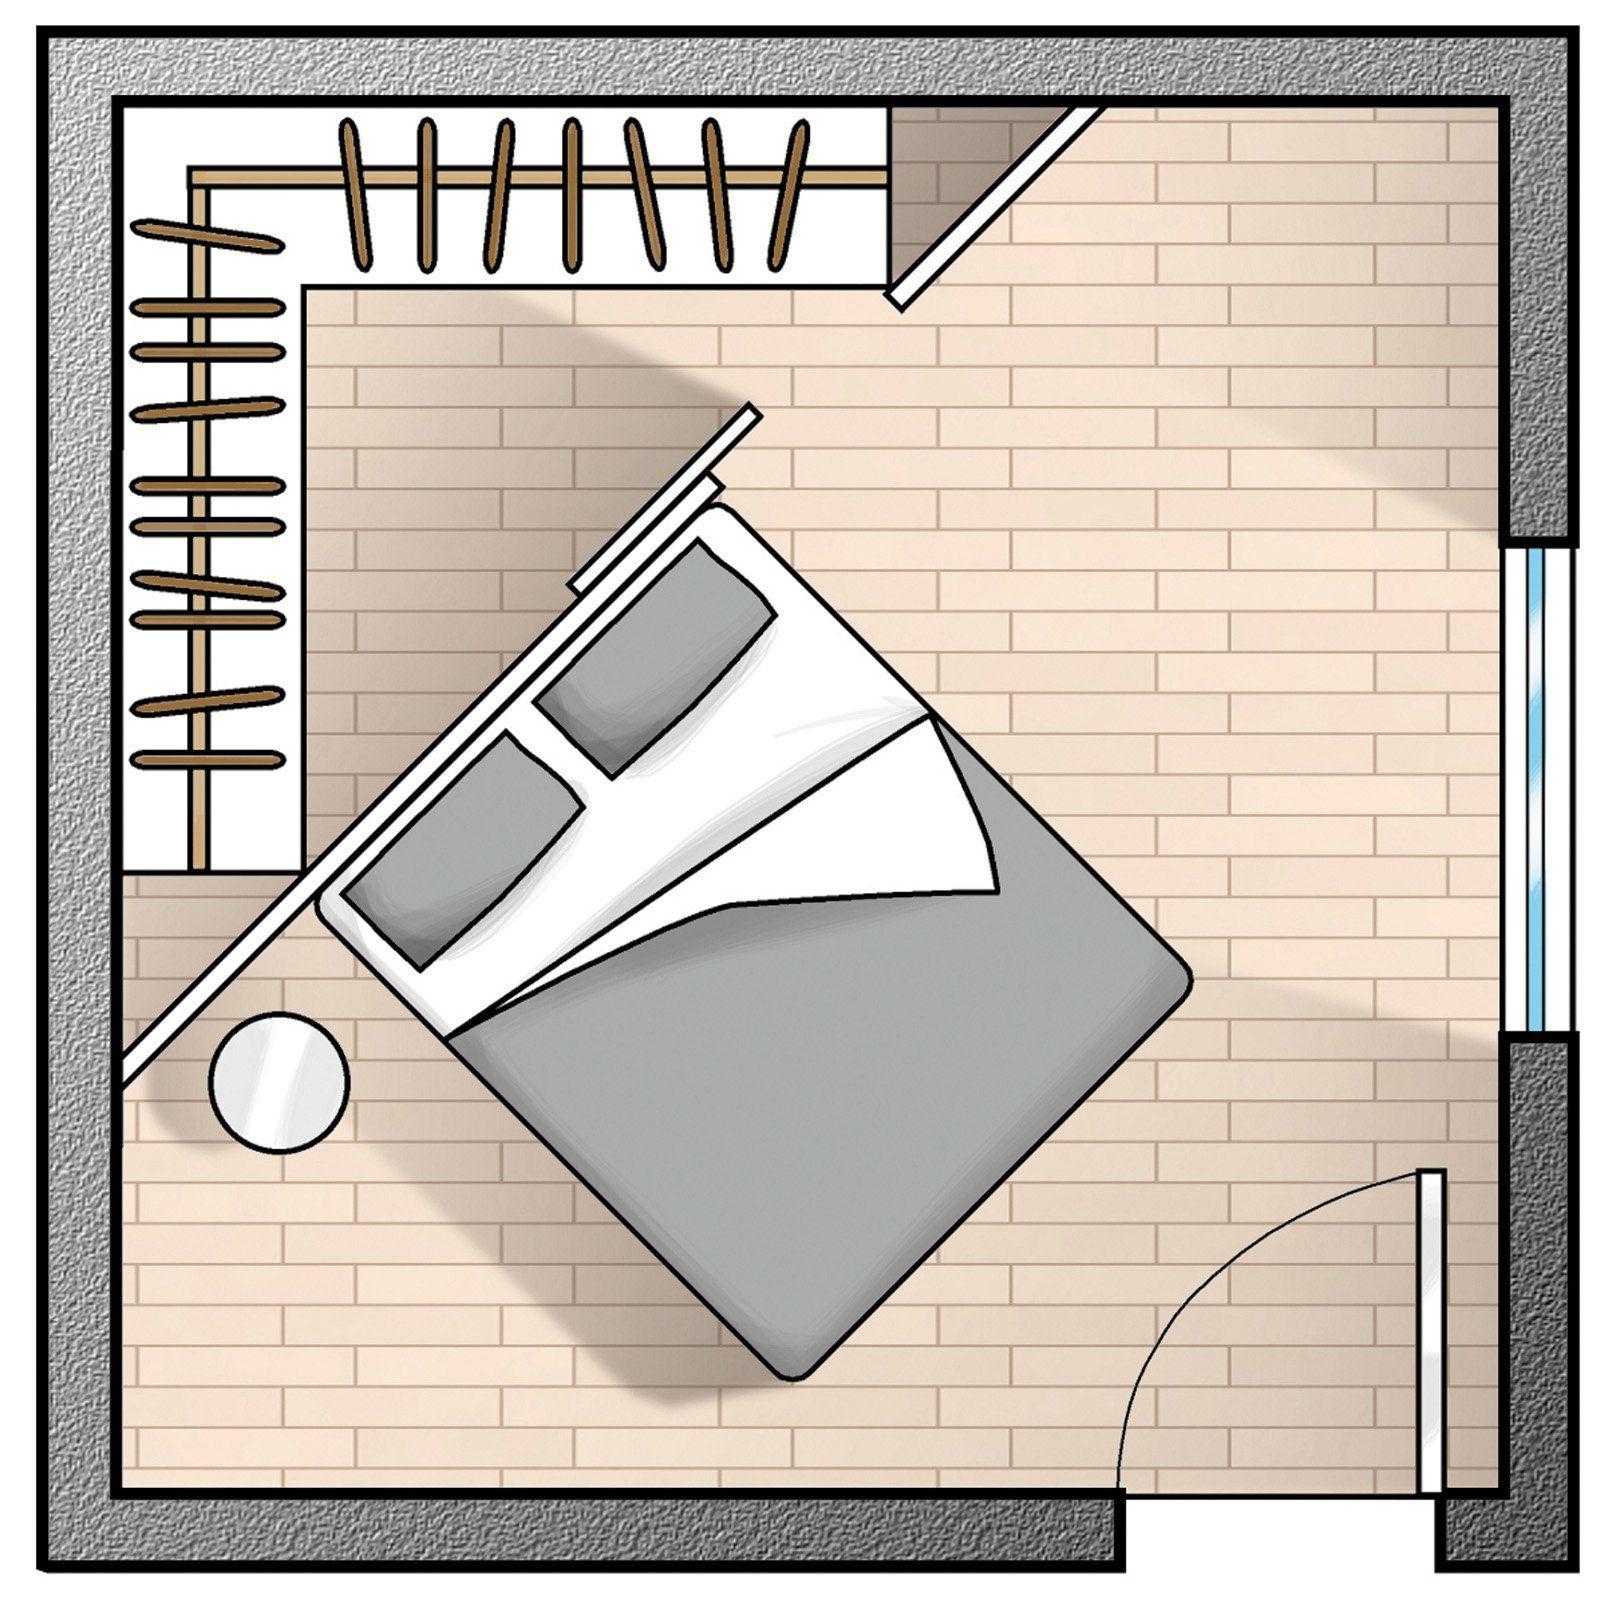 Cabine armadio, soluzione trendy | Cameras, Bedrooms and Interiors